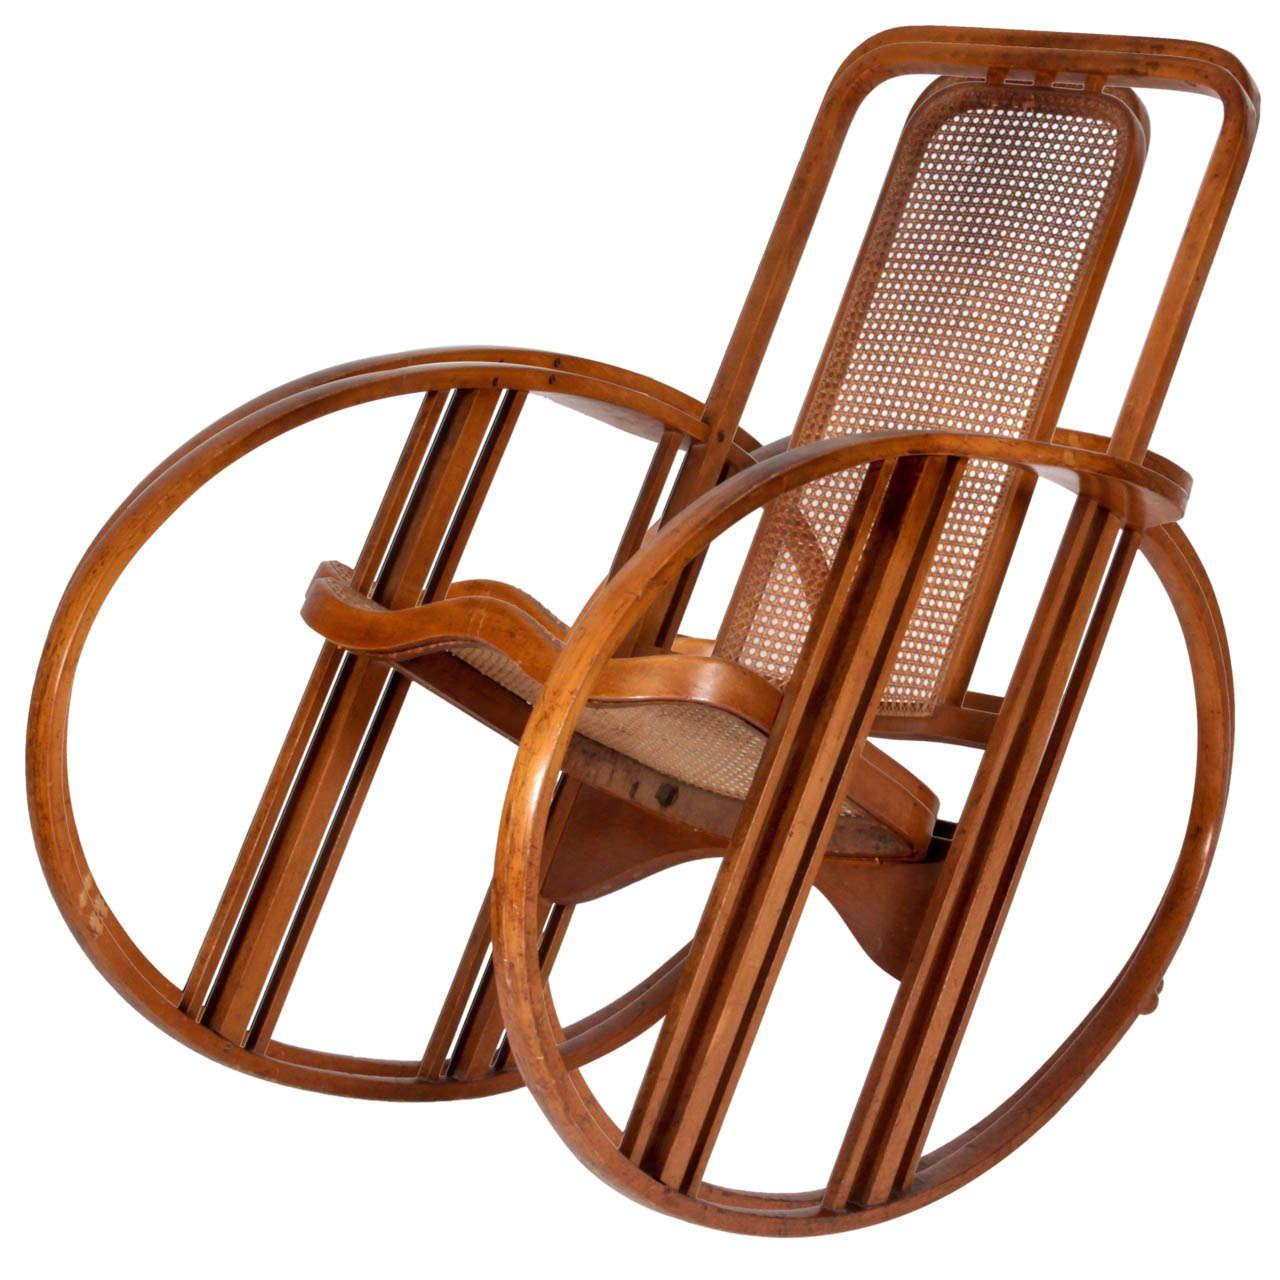 1920s Rocking Chair Most Expensive Antonio Volpe Josef Hoffmann Attr Egg C 1920